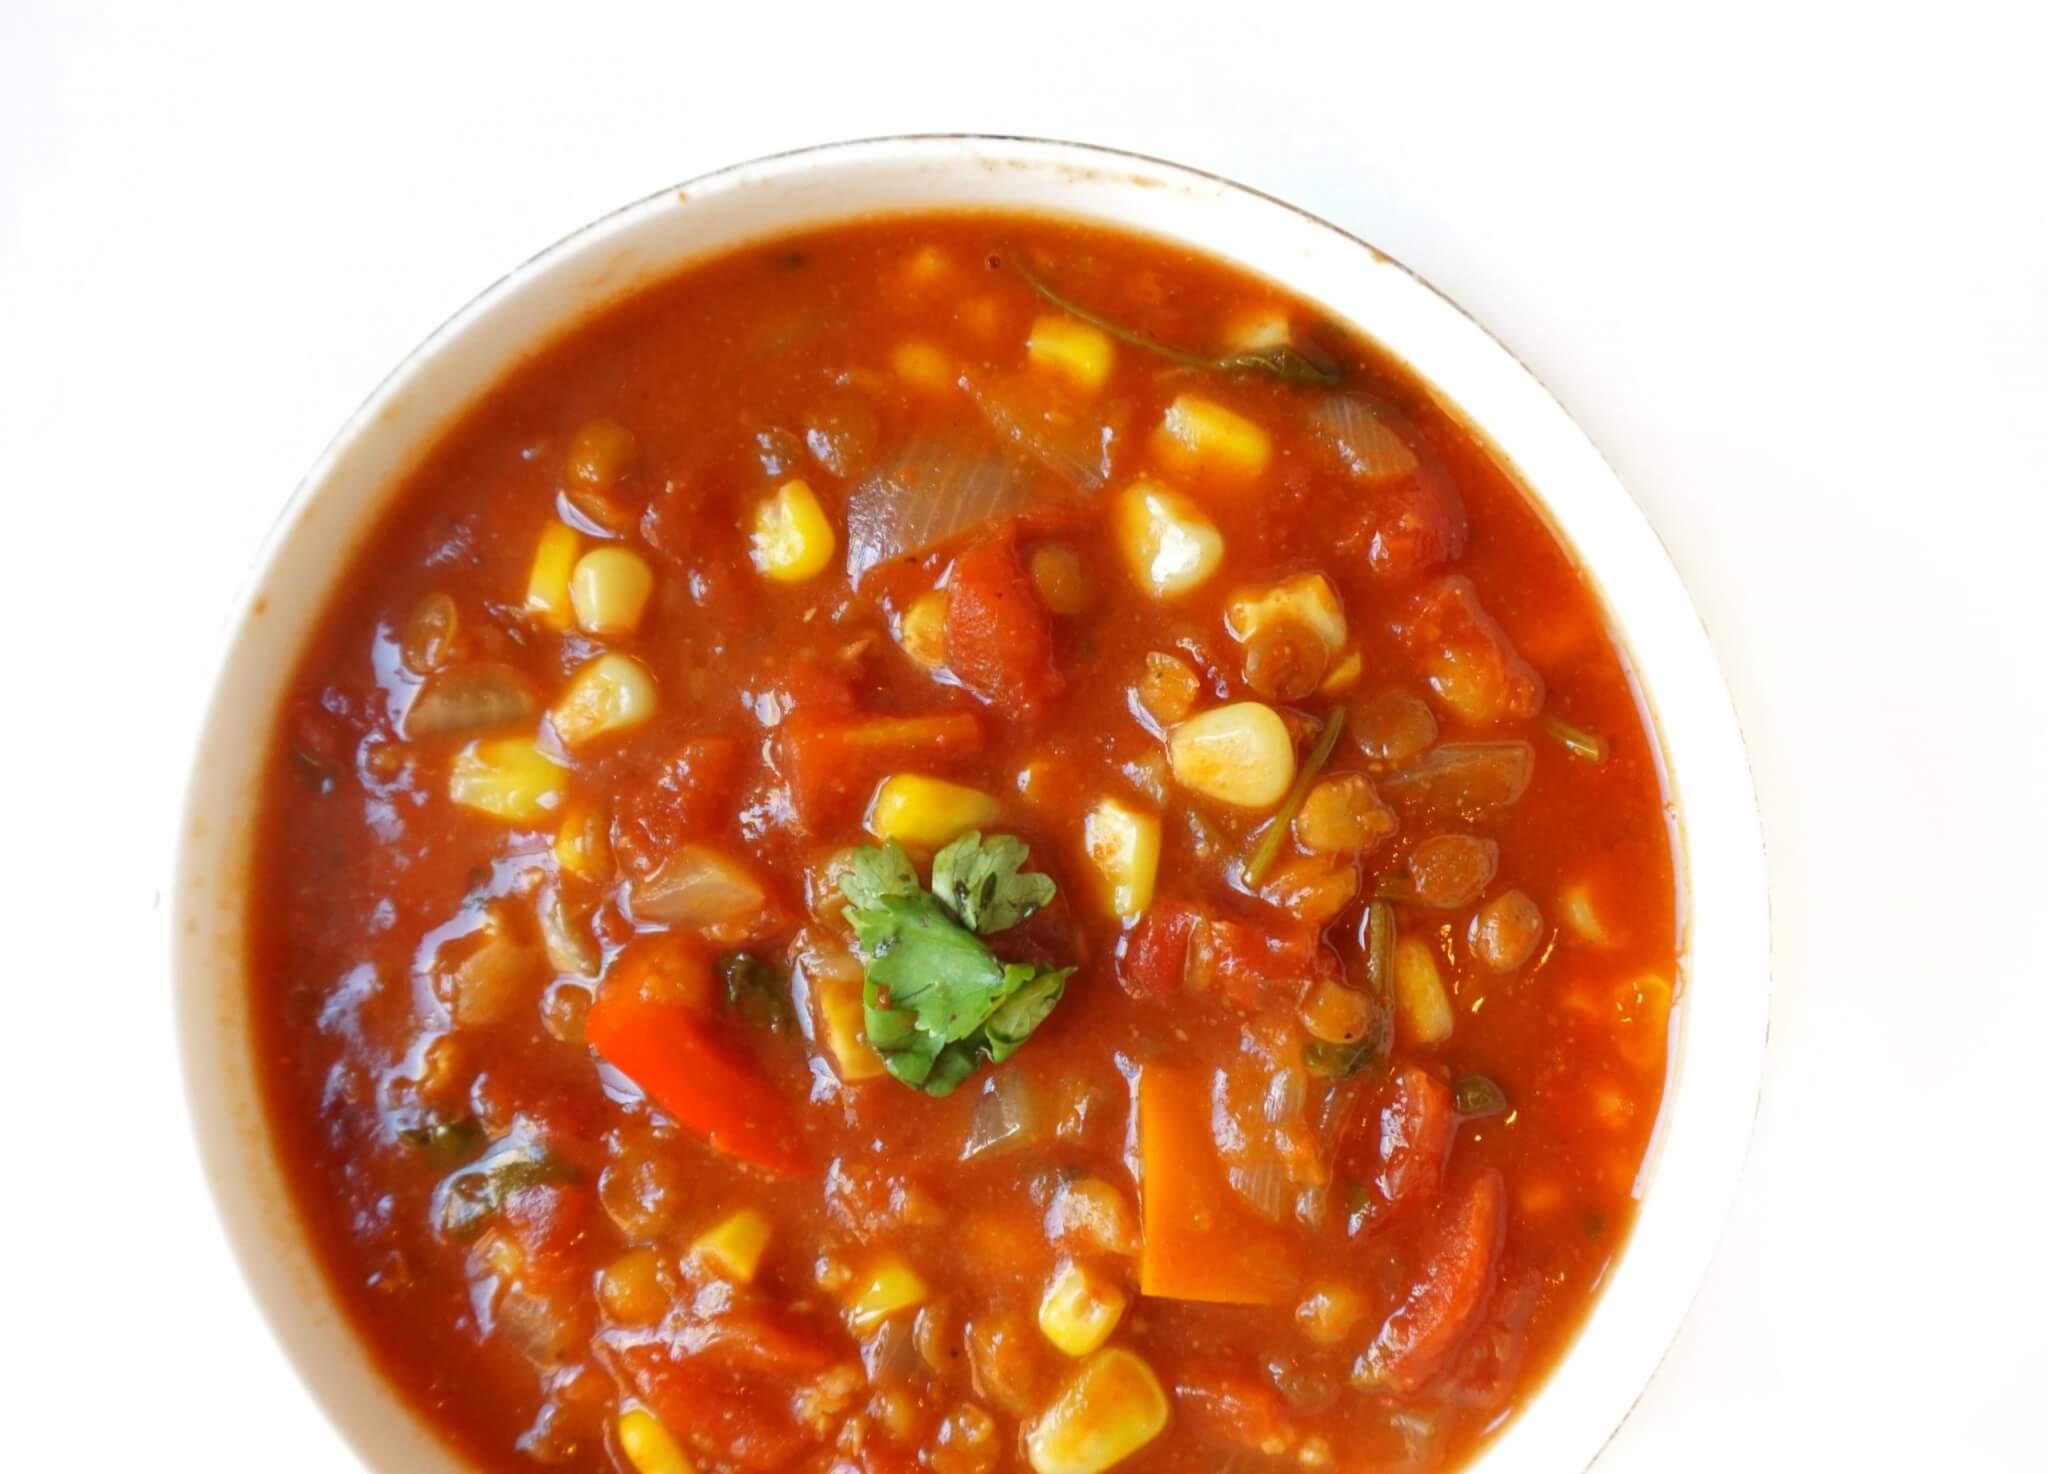 Vegan One Pot Lentil Chili